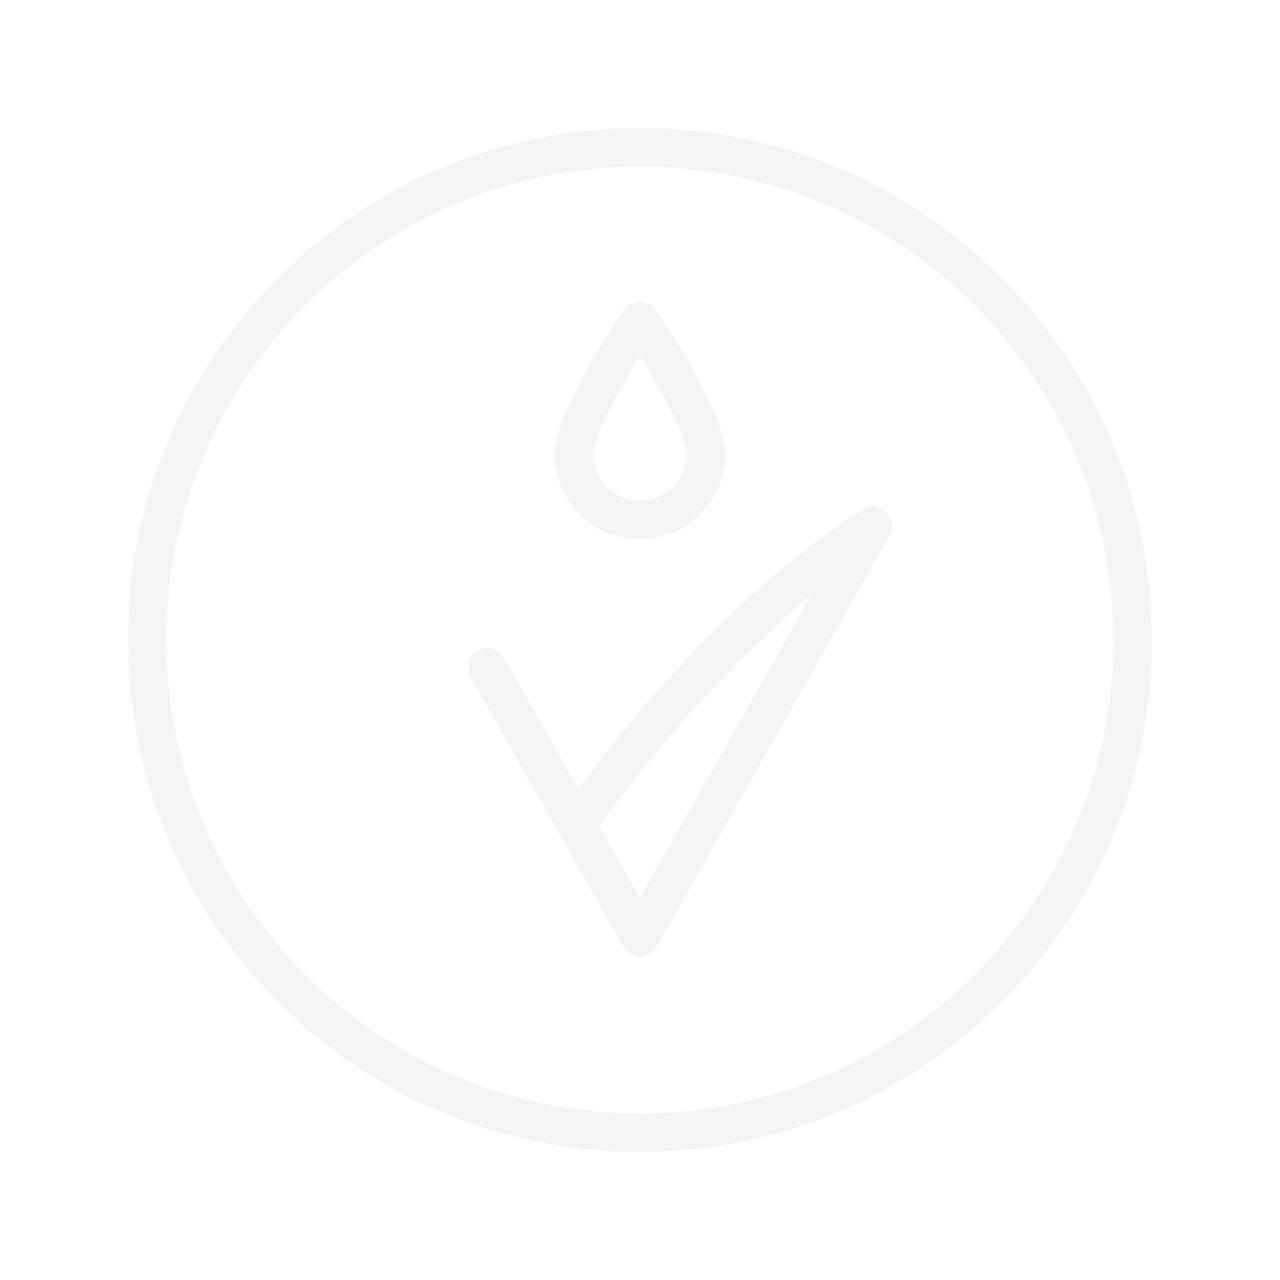 LA ROCHE-POSAY Anthelios Pigmentation Tinted Cream SPF50 50ml